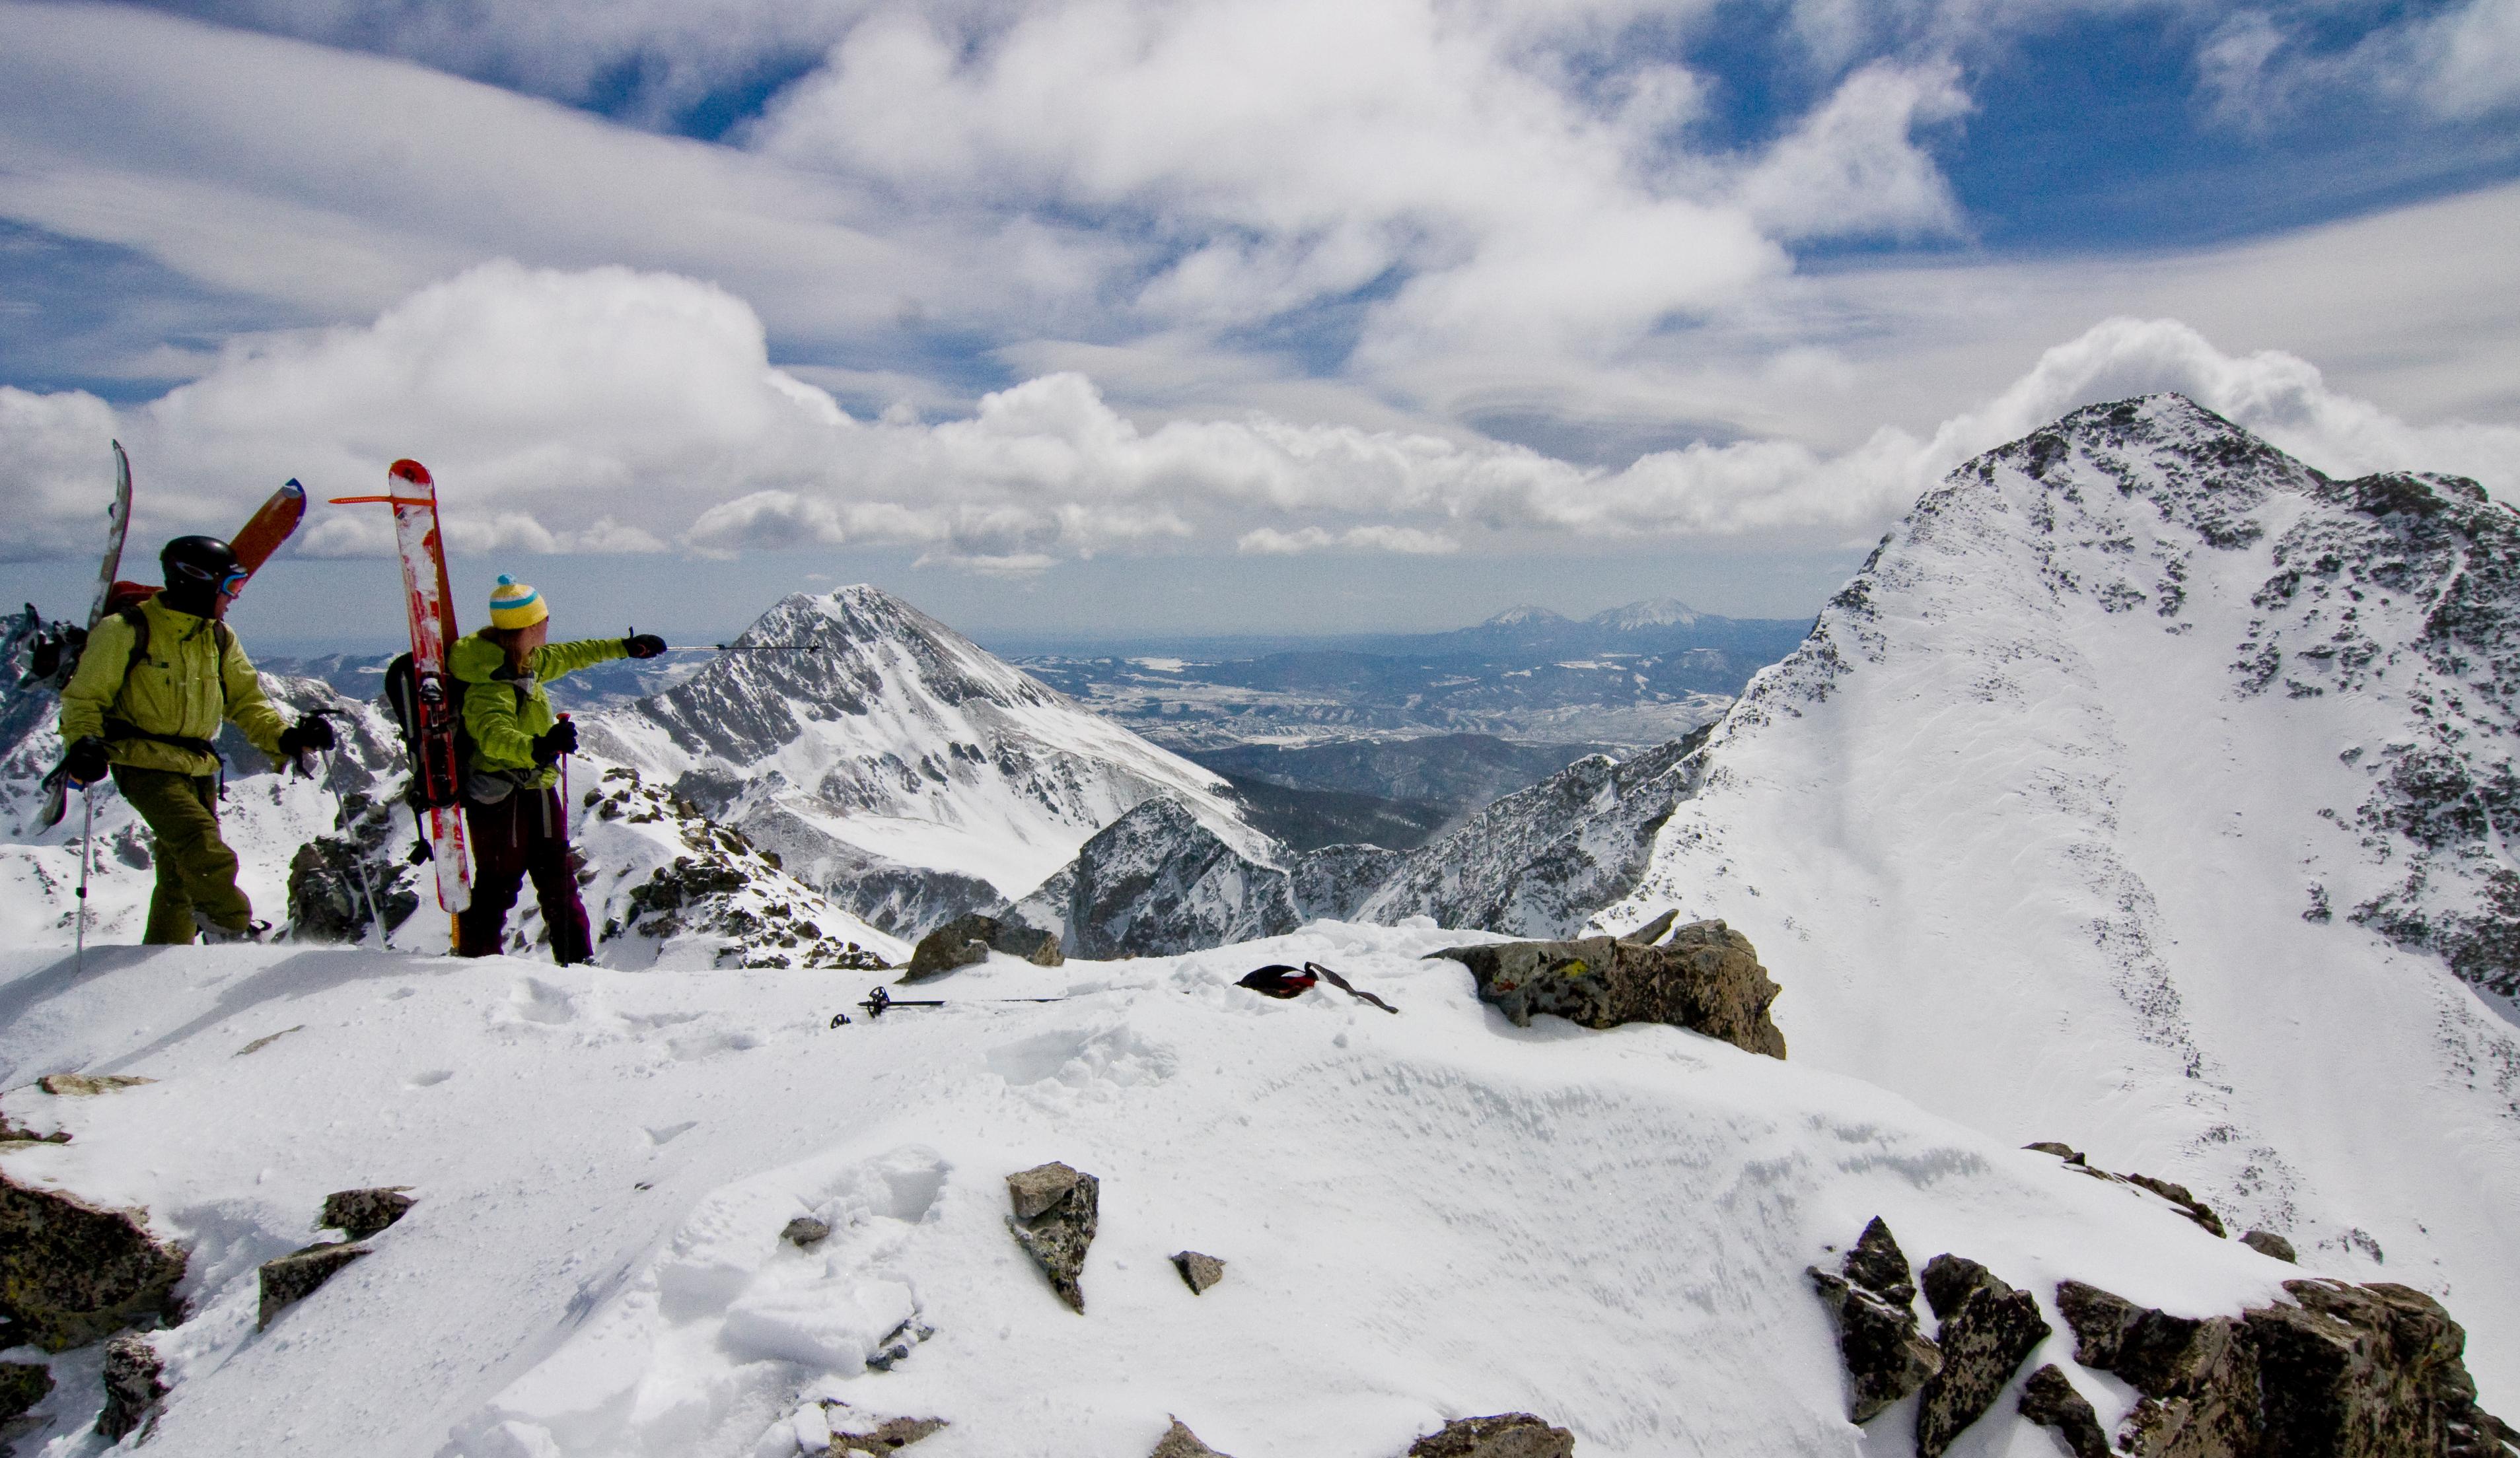 Ellingwood Poing and Blanca Peak Ski